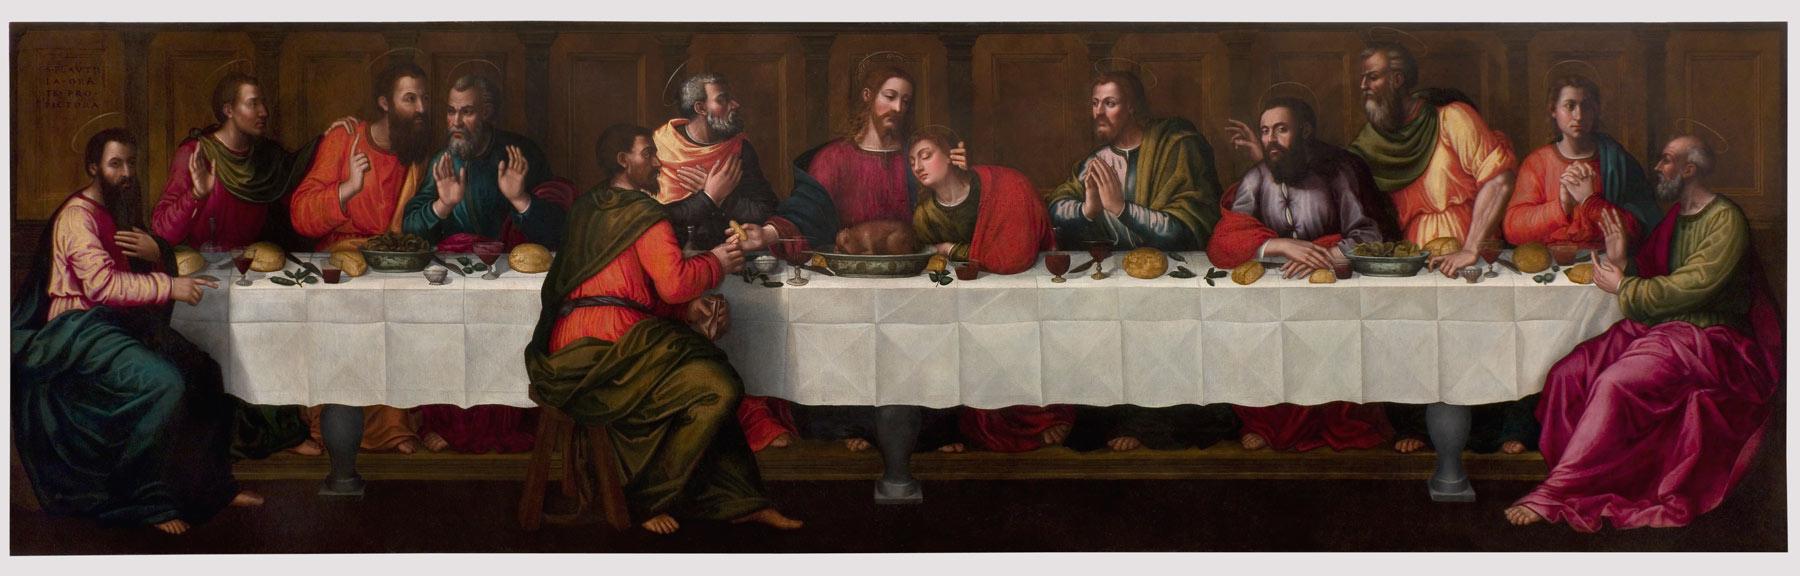 Картинки по запросу sister plautilla nelli last supper